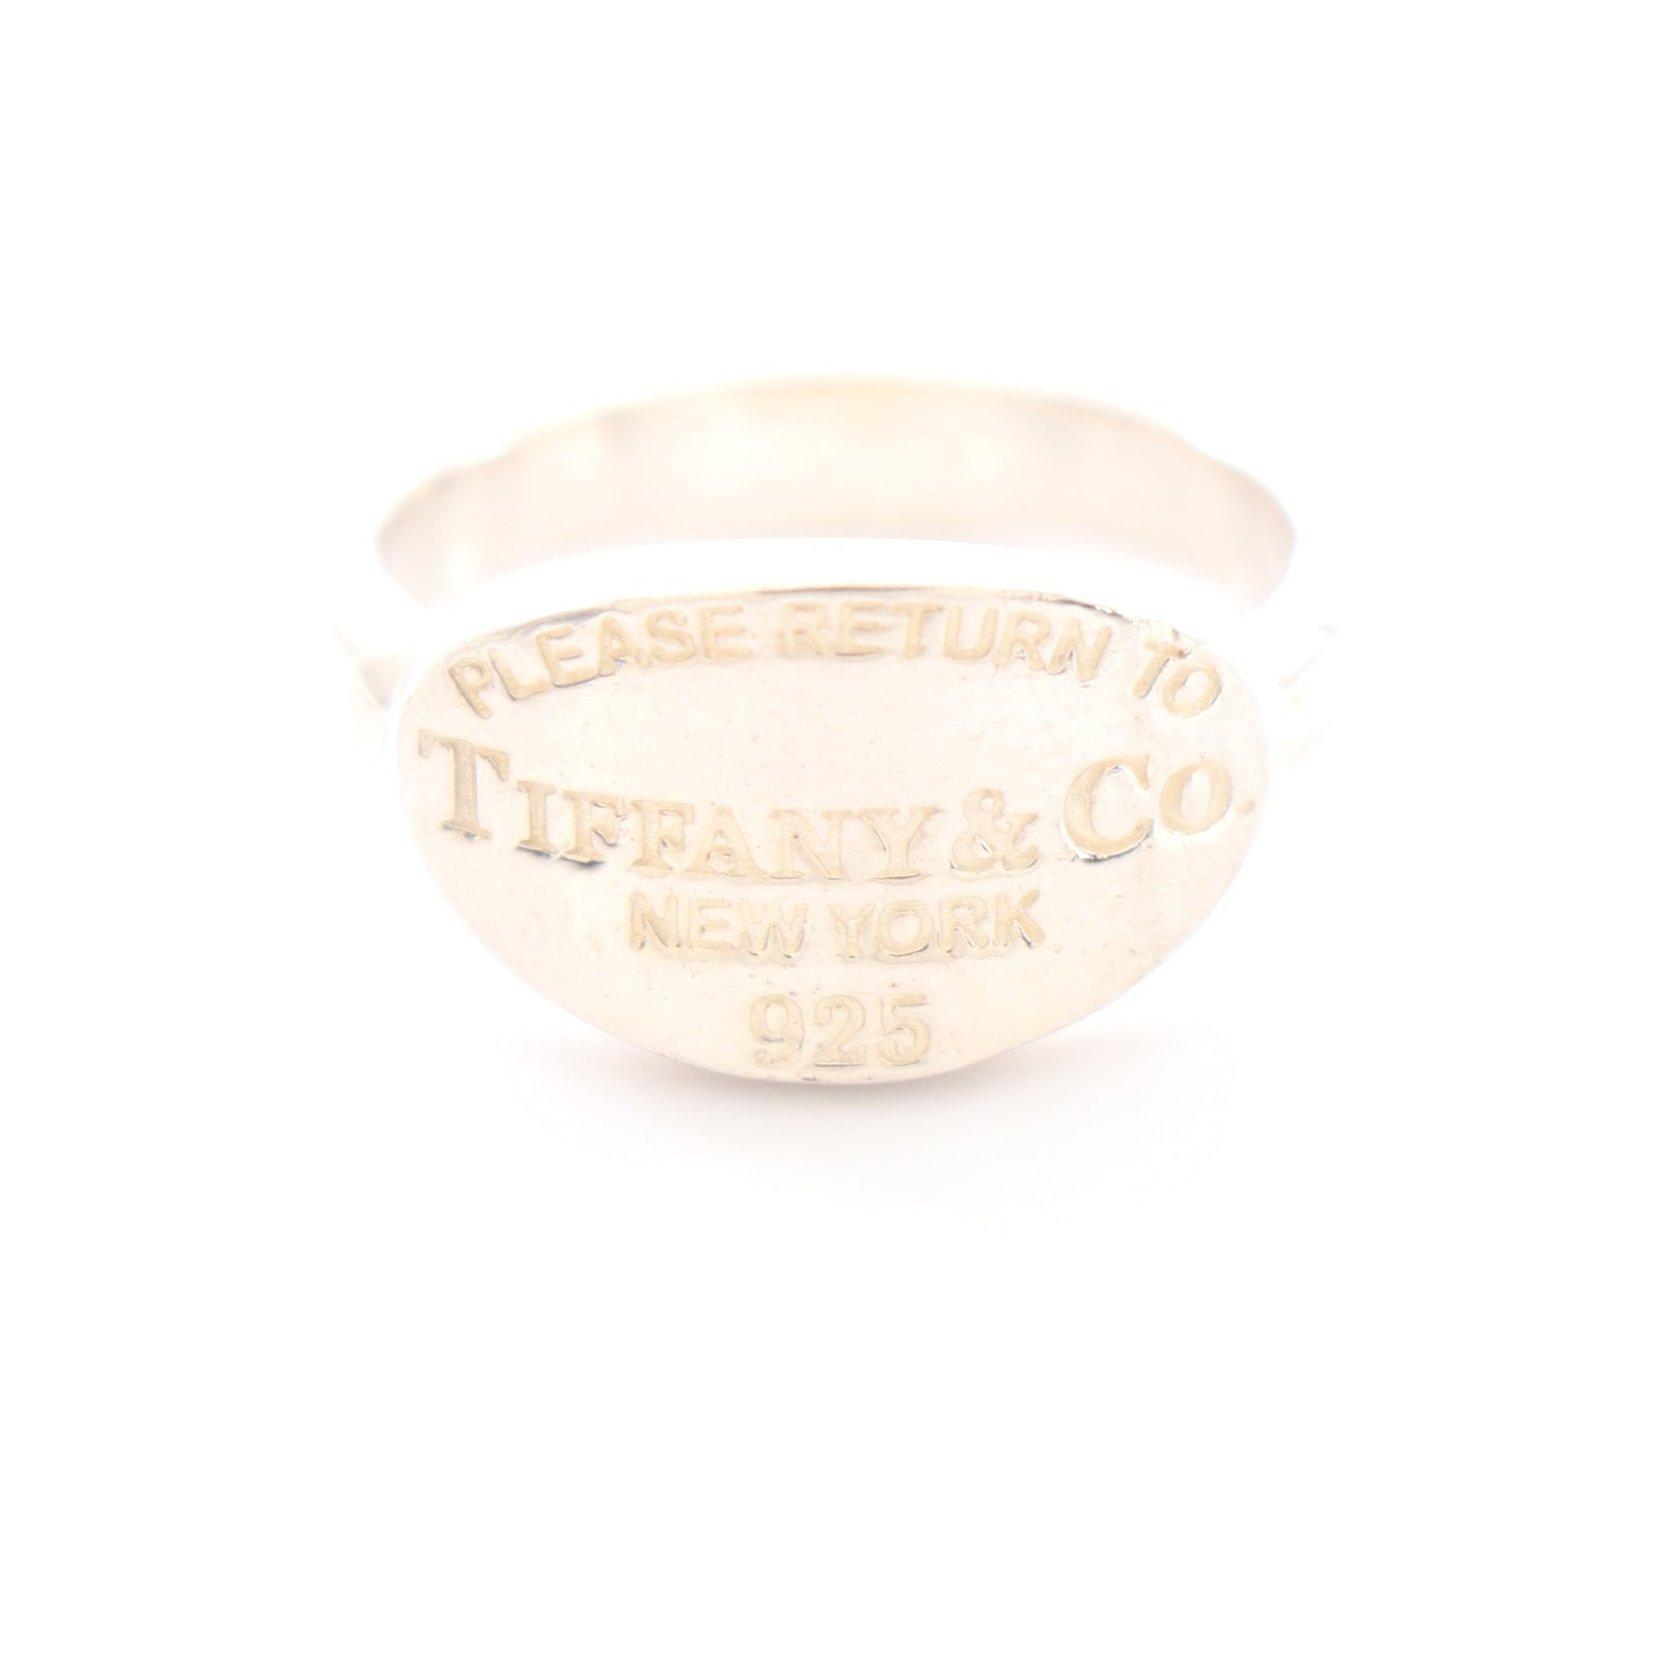 TIFFANY & Co.・アクセサリー・リターントゥティファニー オーバル リング 指輪 SV925 シルバー